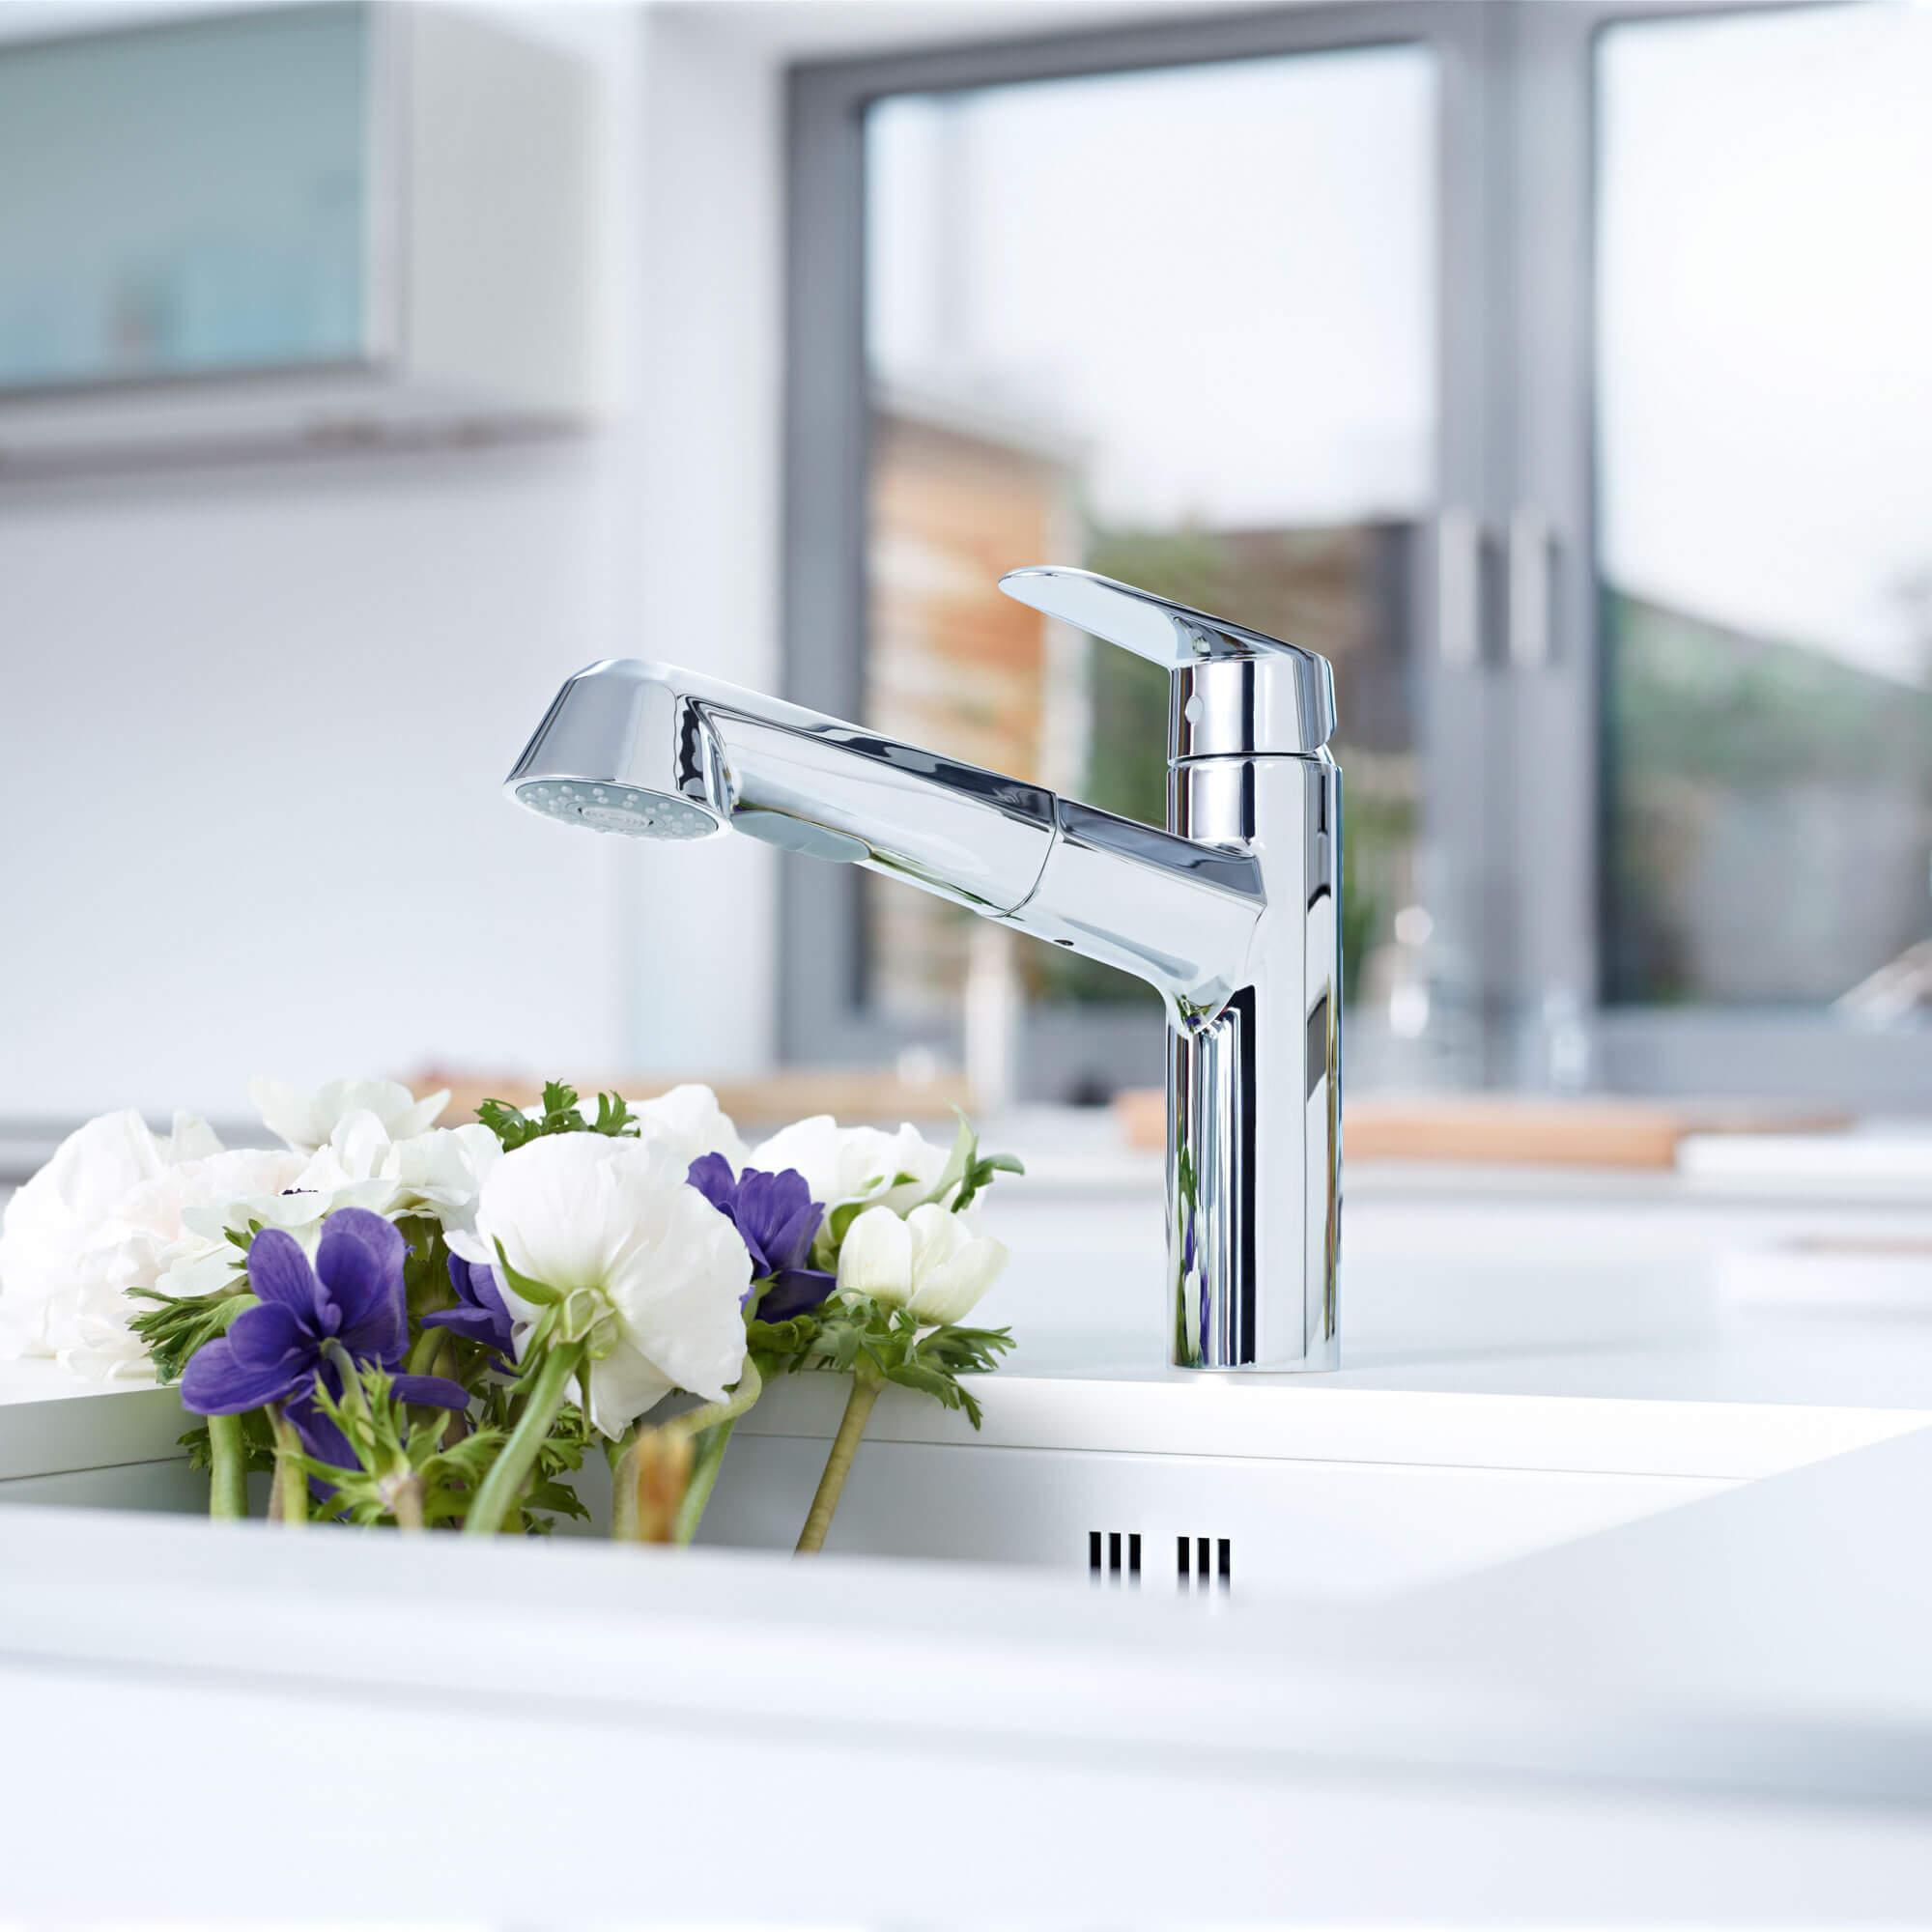 GROHE Eurodisc Cosmopolitan kitchen faucet